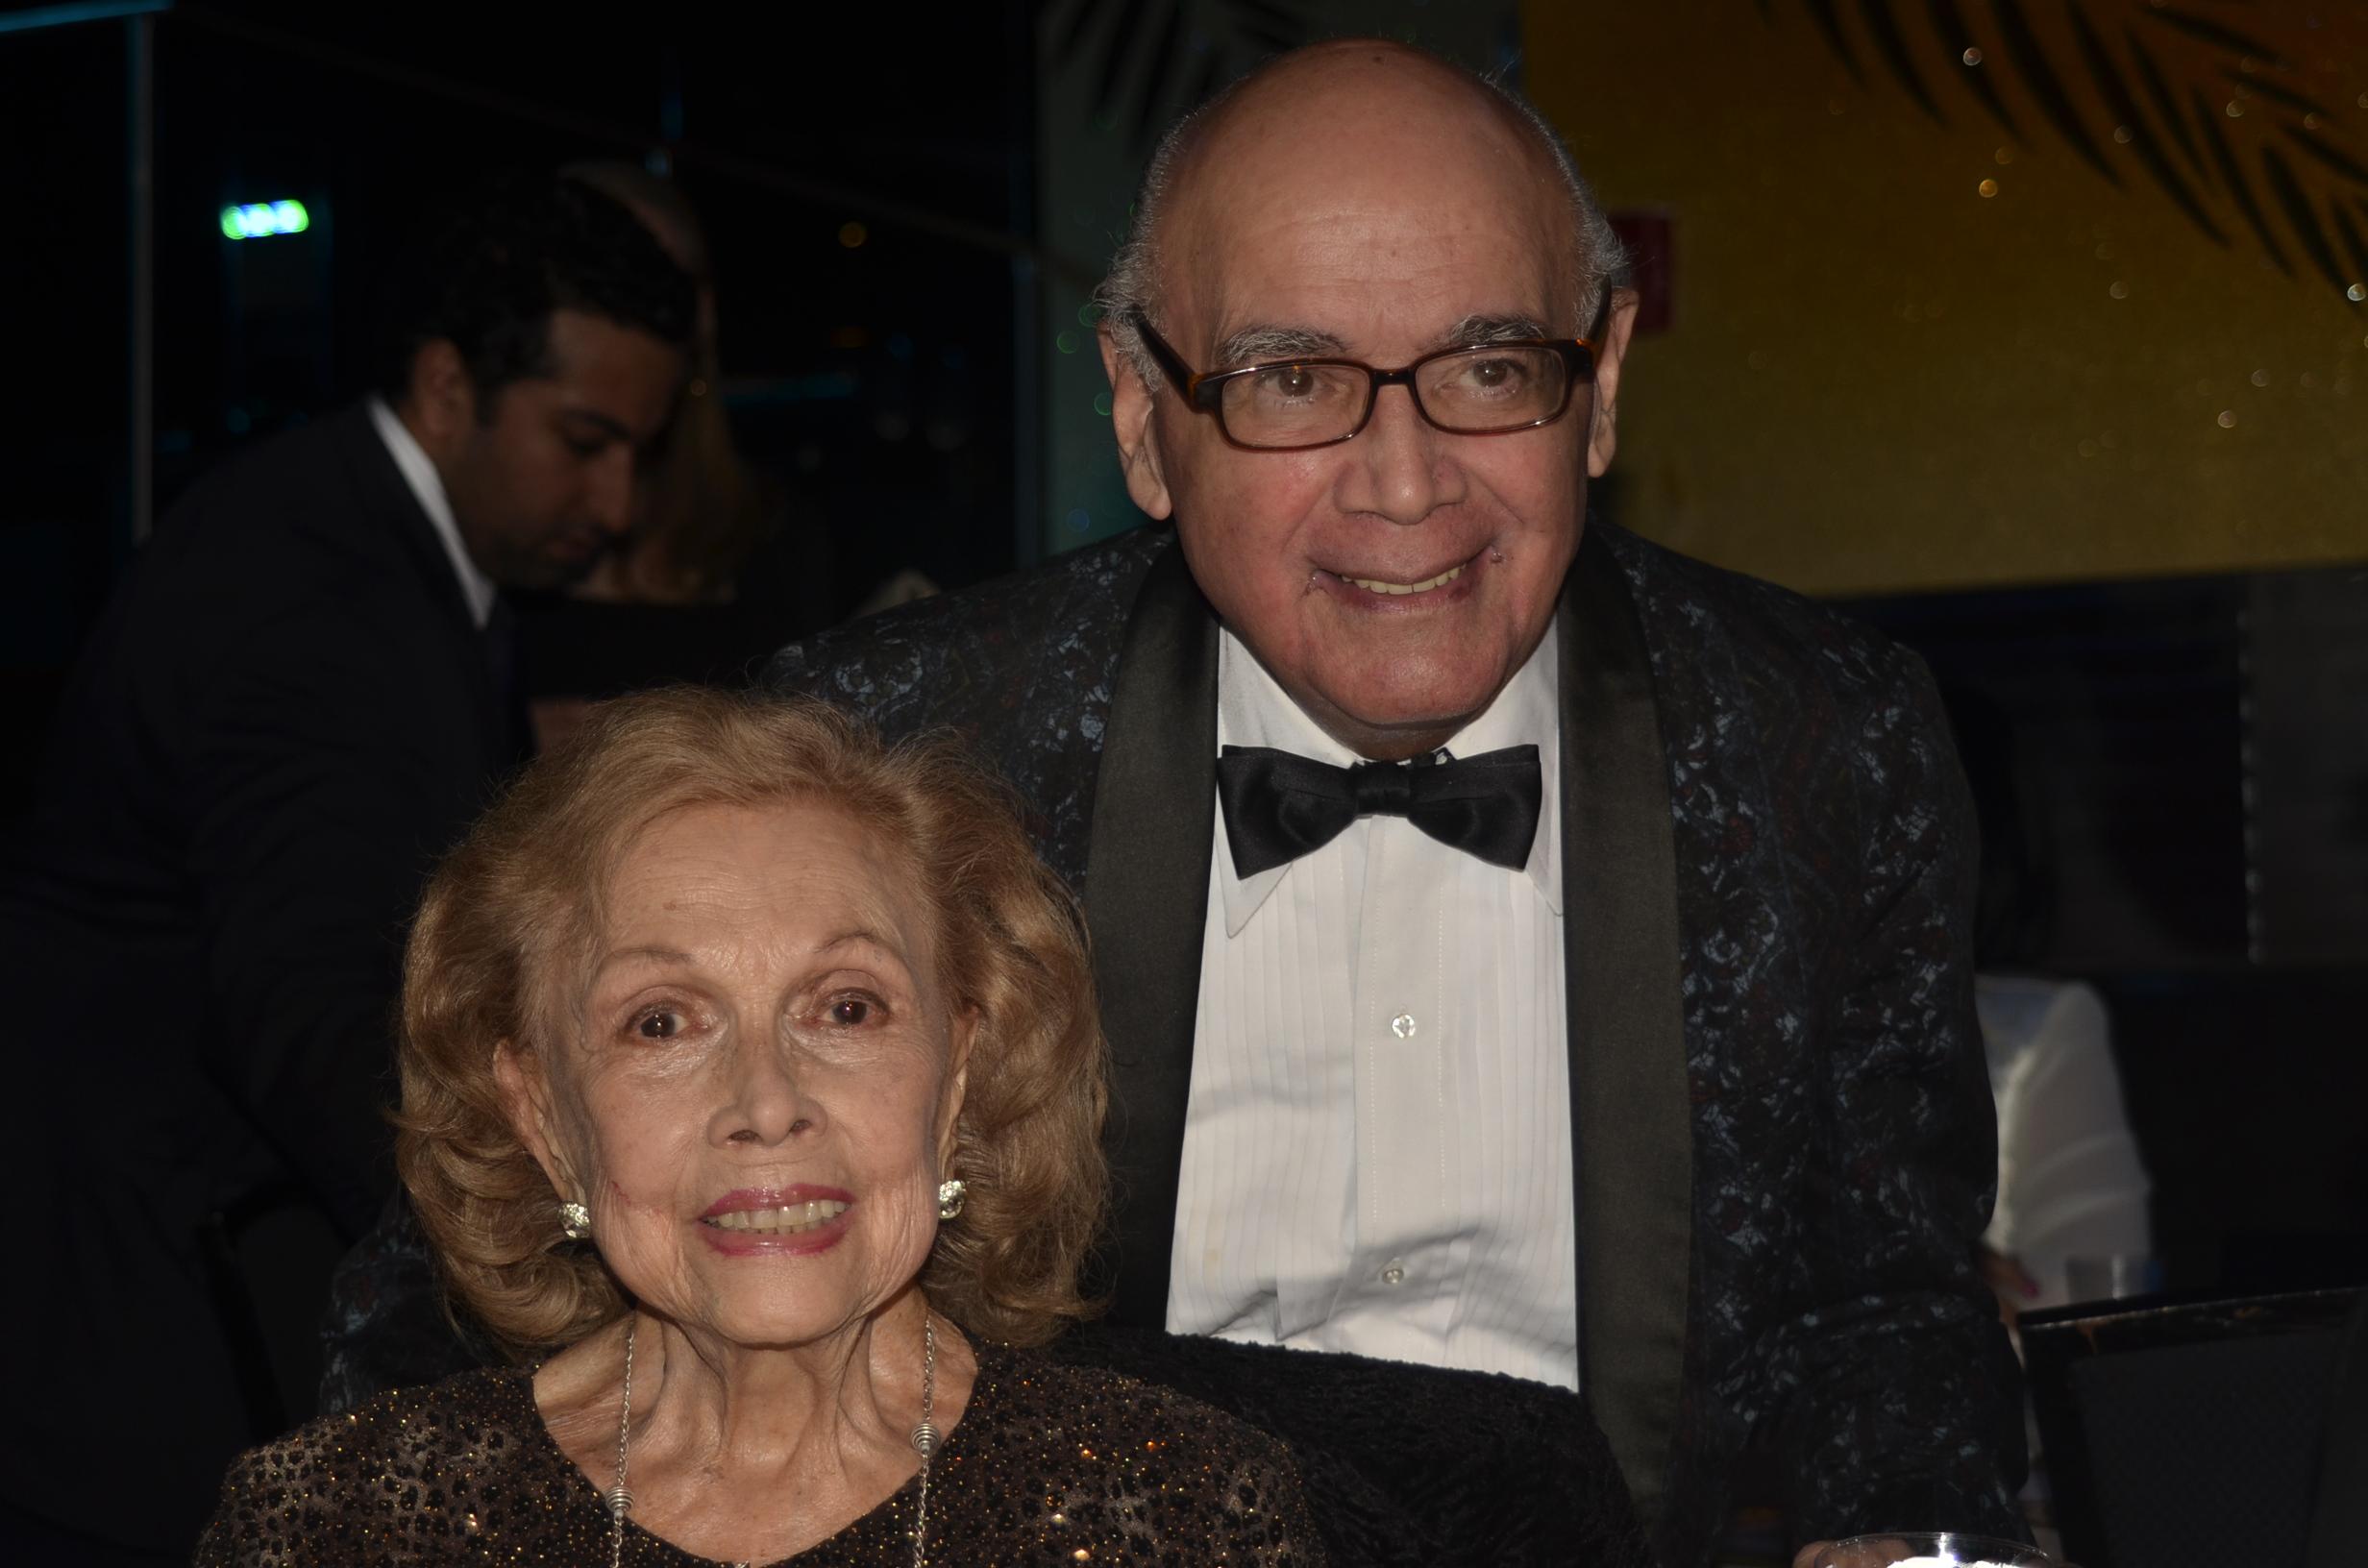 Fernando Campos y Anita Vélez-Mitchell